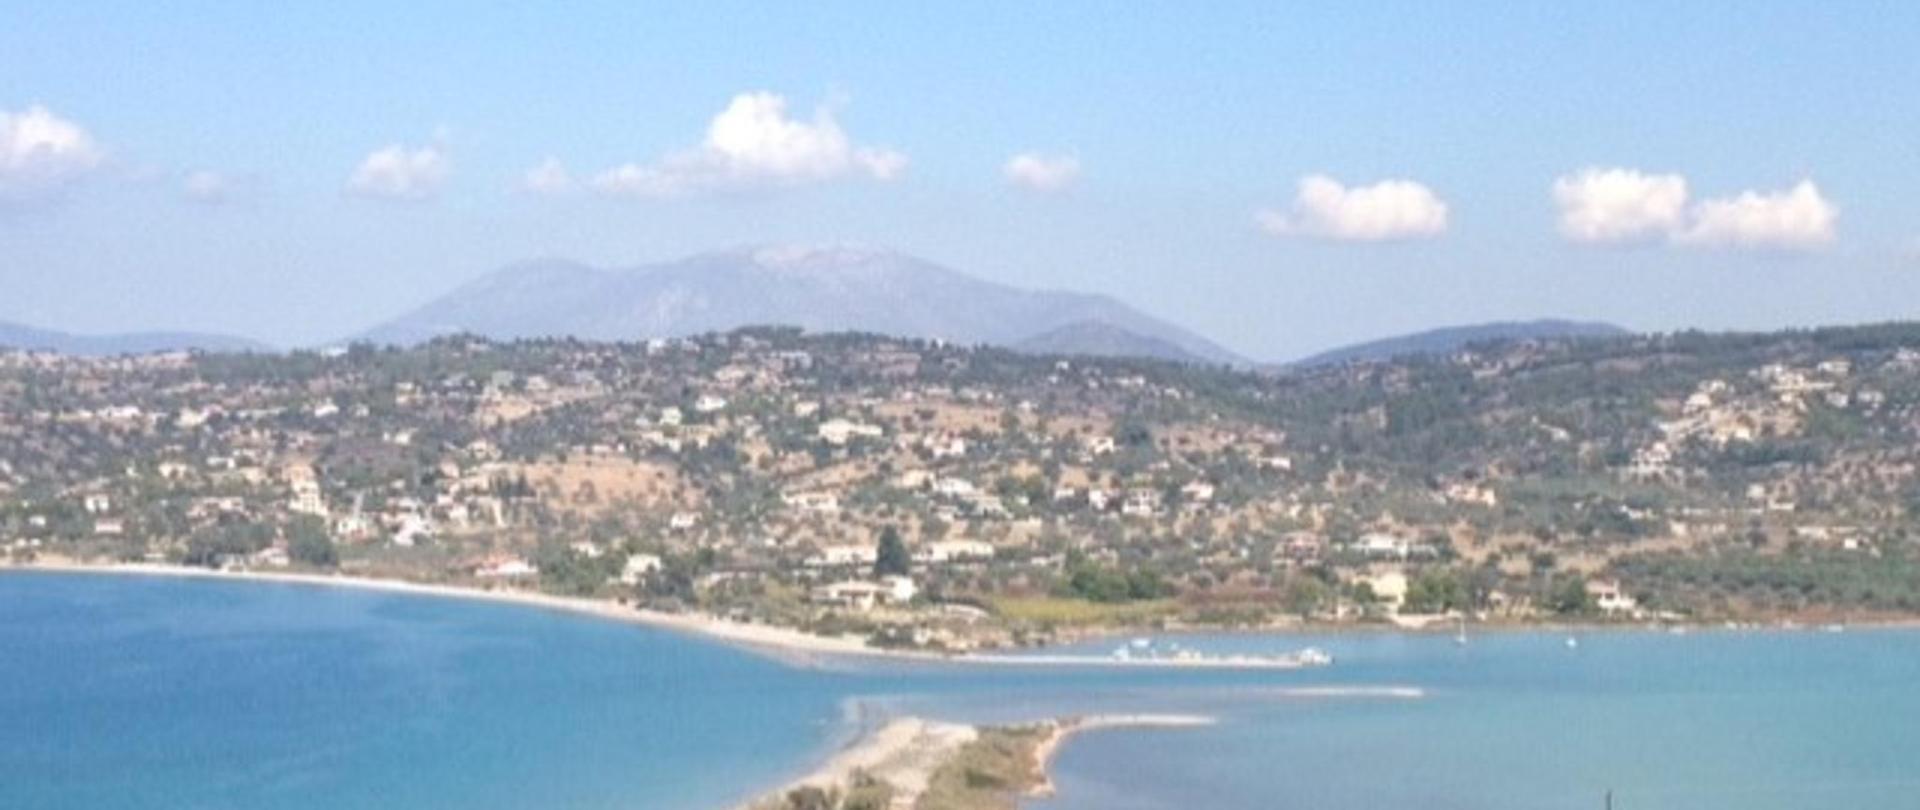 Ververouda Bay